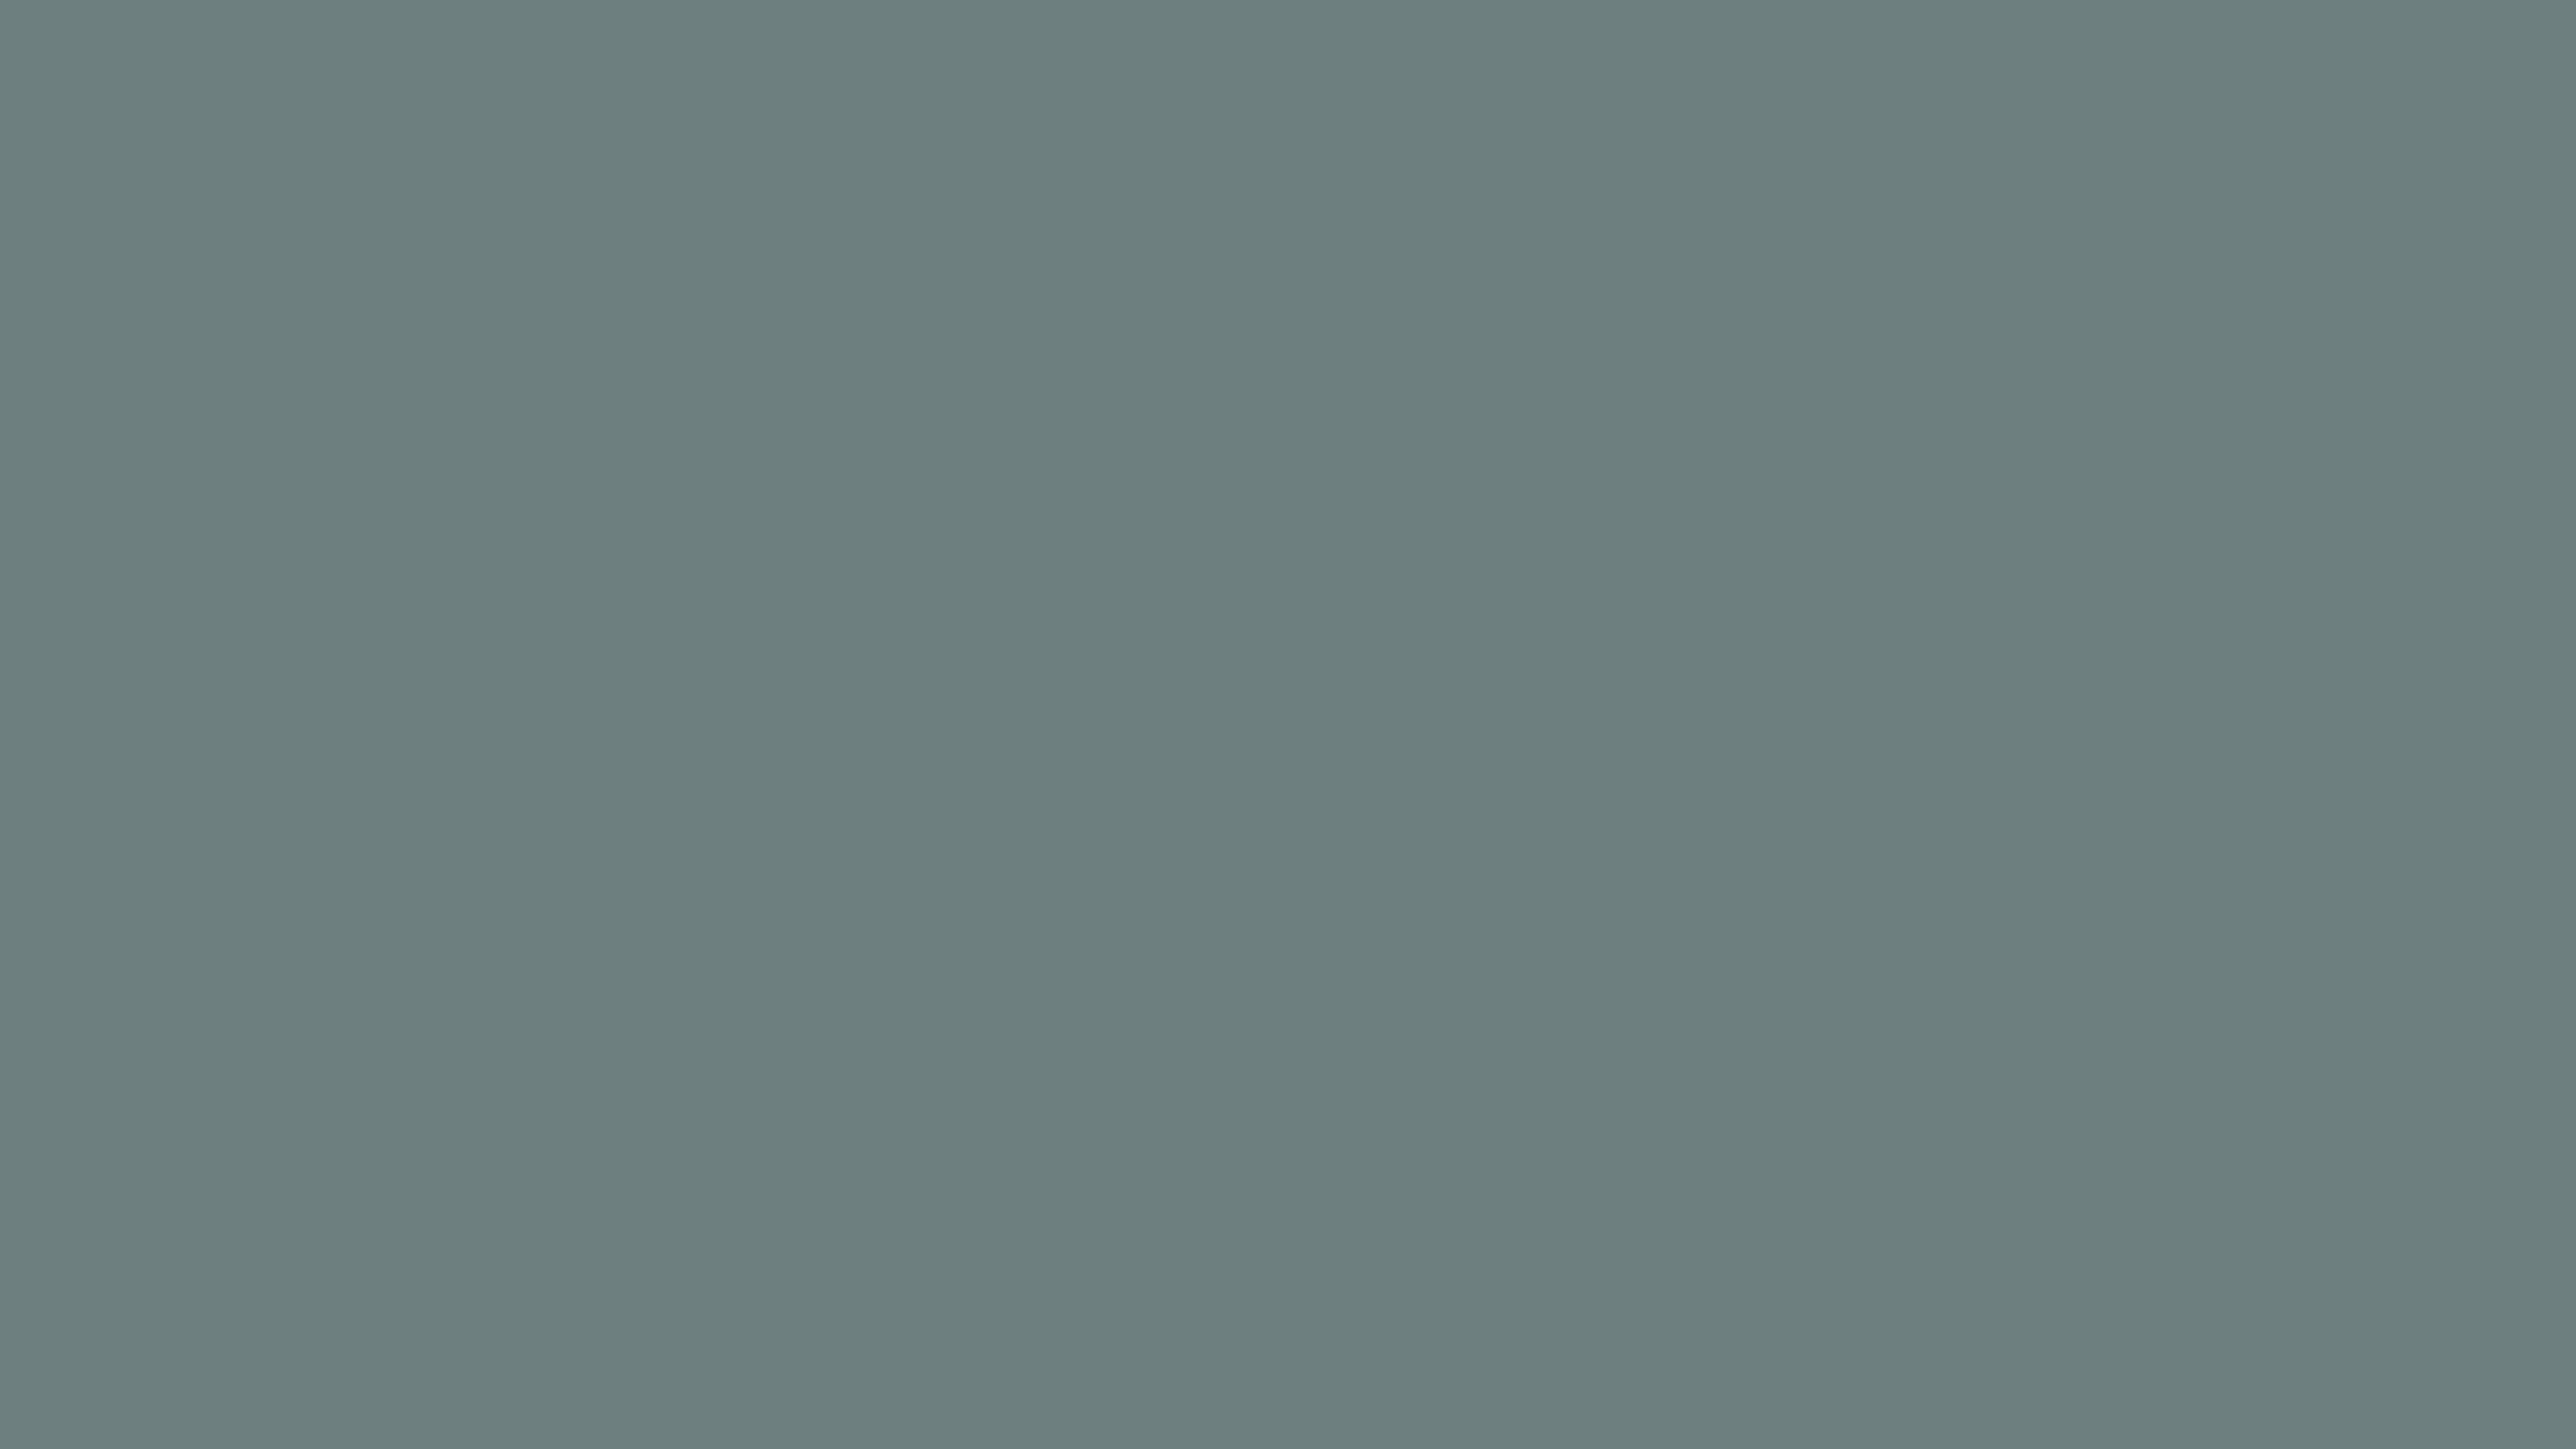 5120x2880 AuroMetalSaurus Solid Color Background